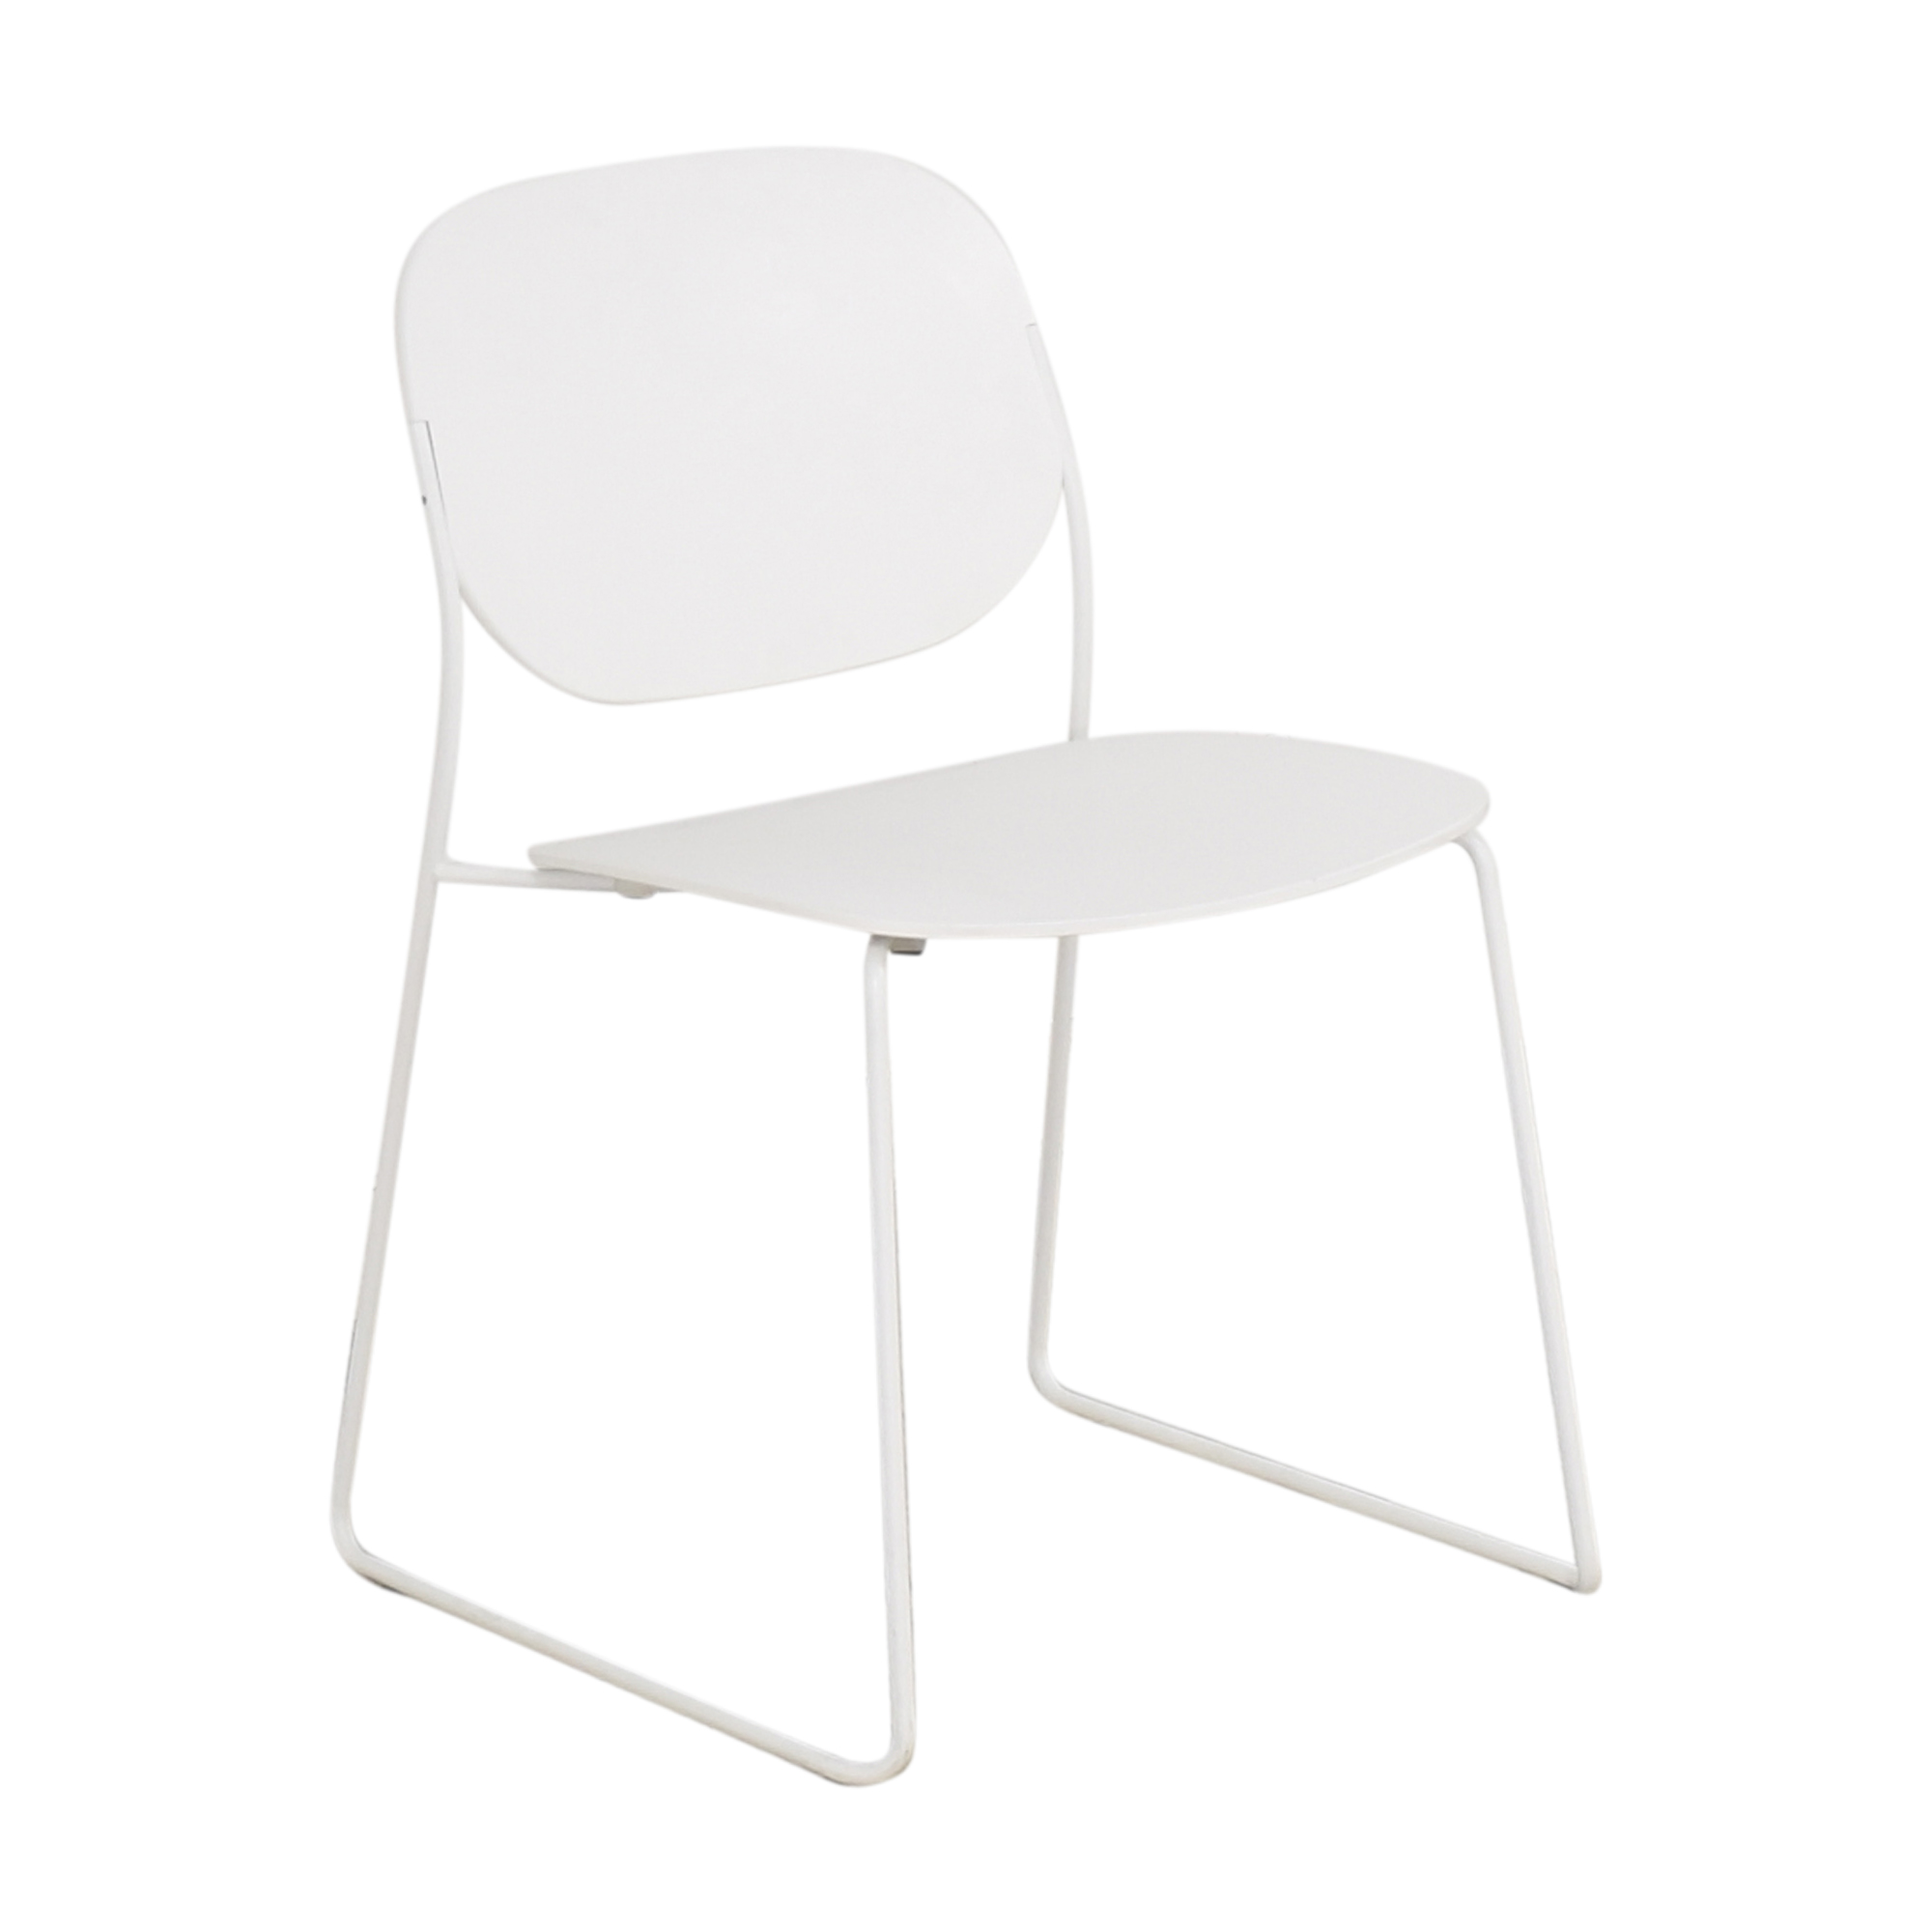 Lapalma Lapalma Olo Dining Chair pa